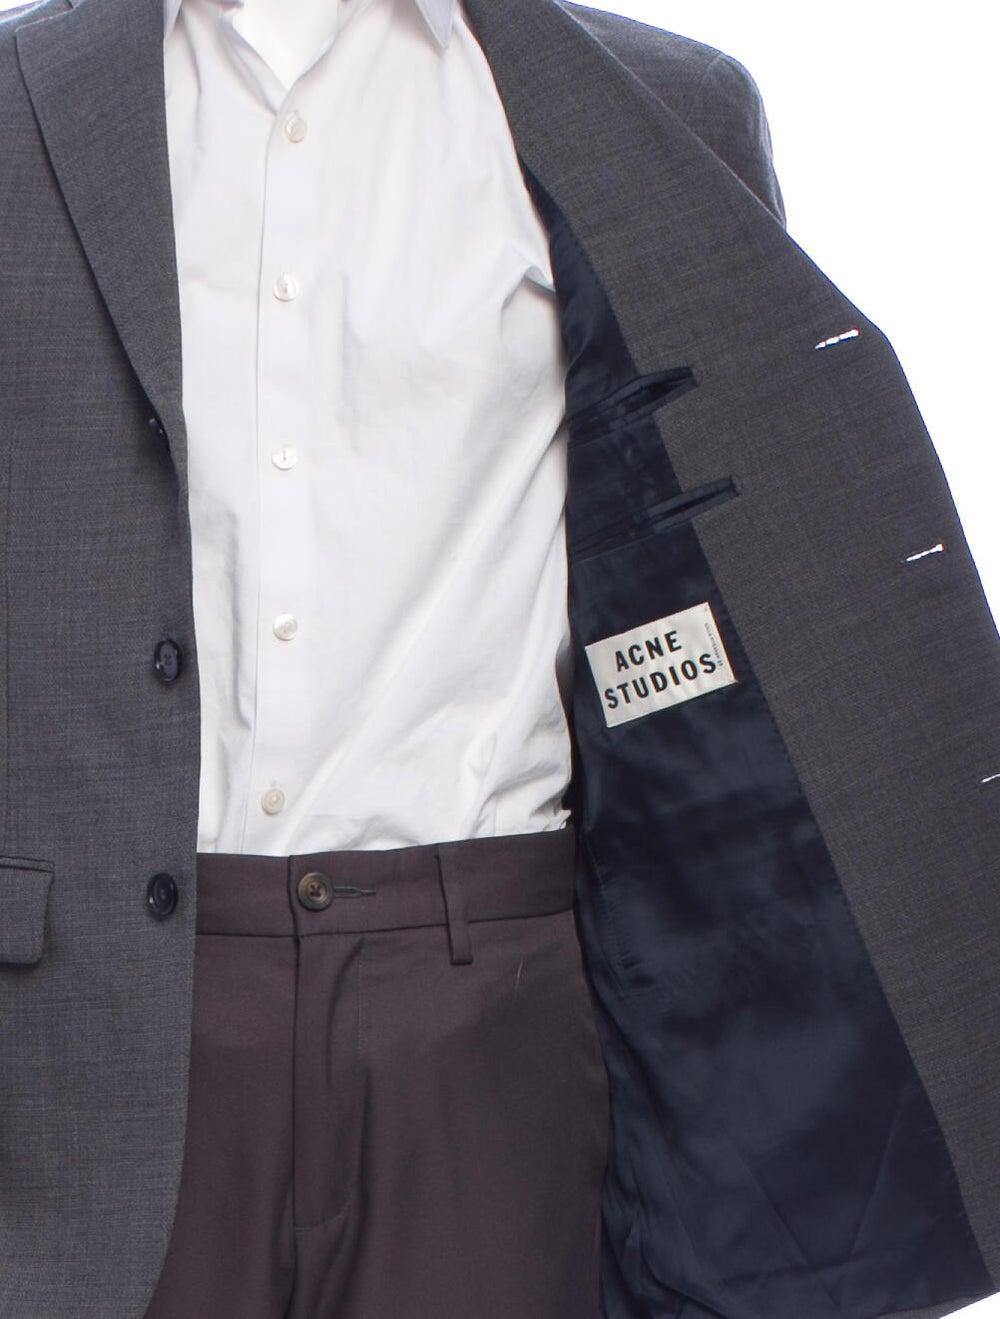 Acne Studios Blazer Grey - image 4